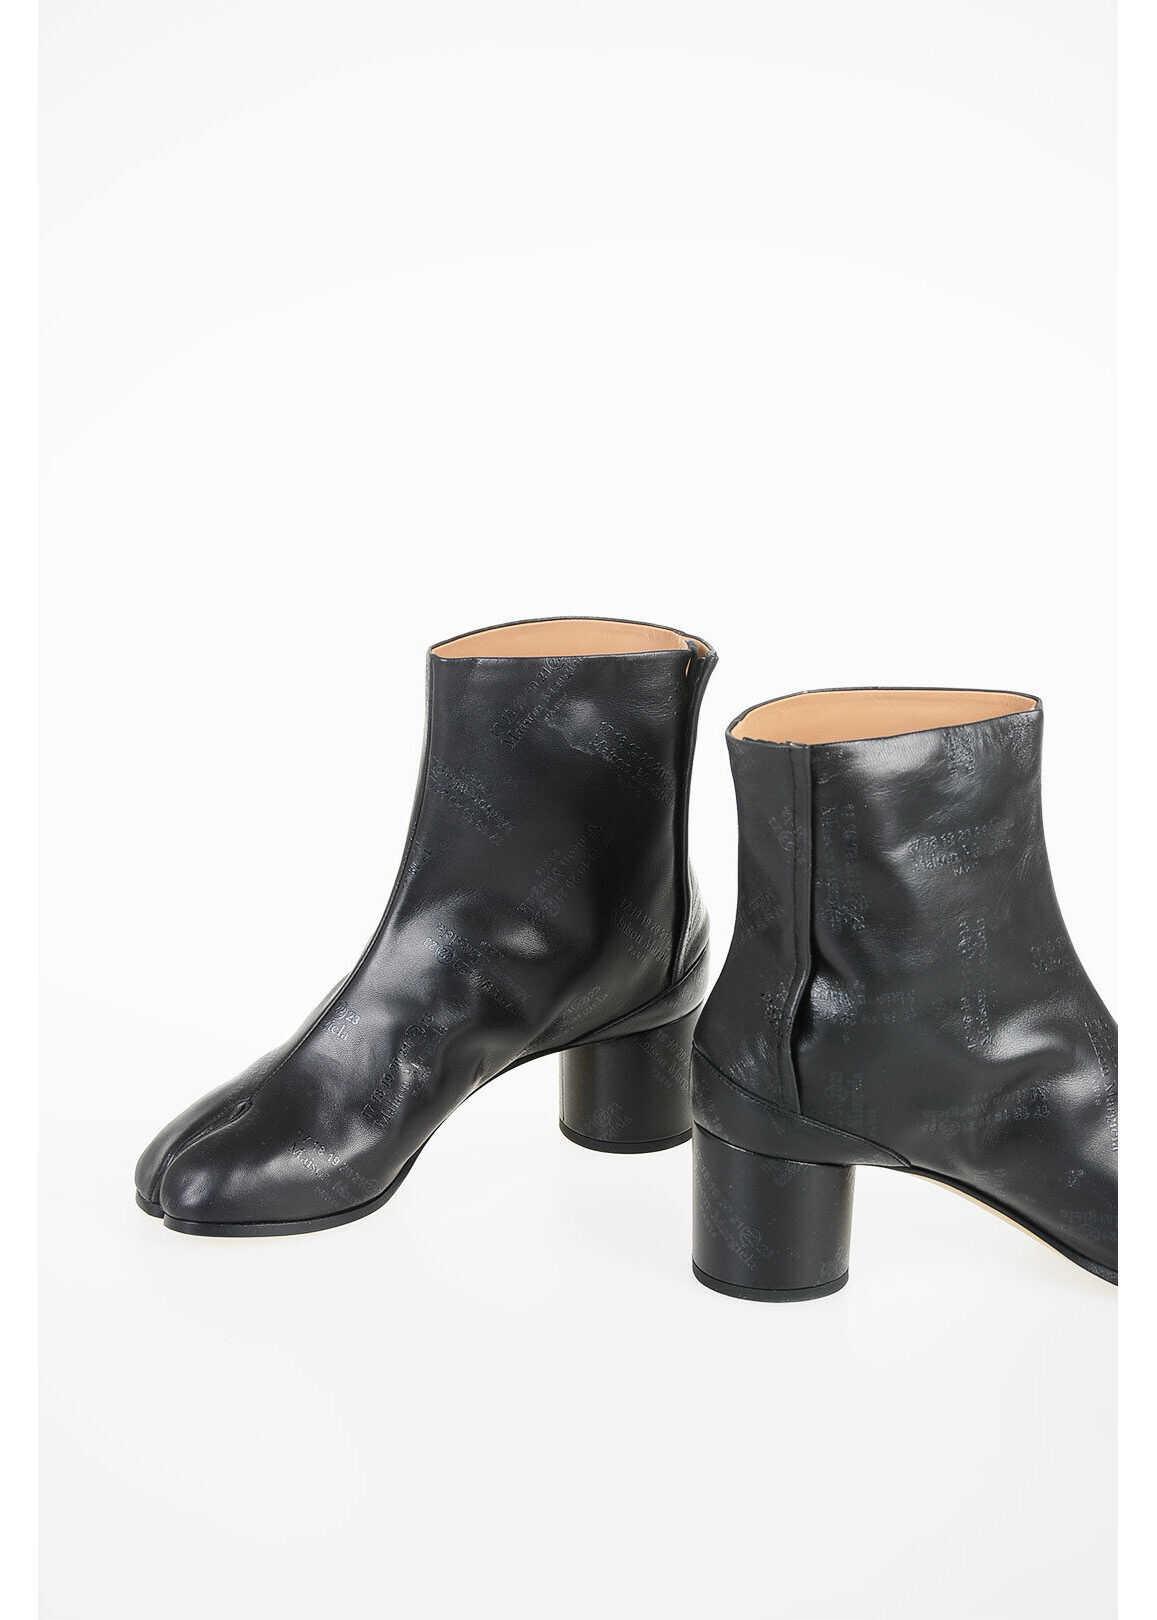 Maison Margiela MM22 6cm Leather Ankle Boot BLACK